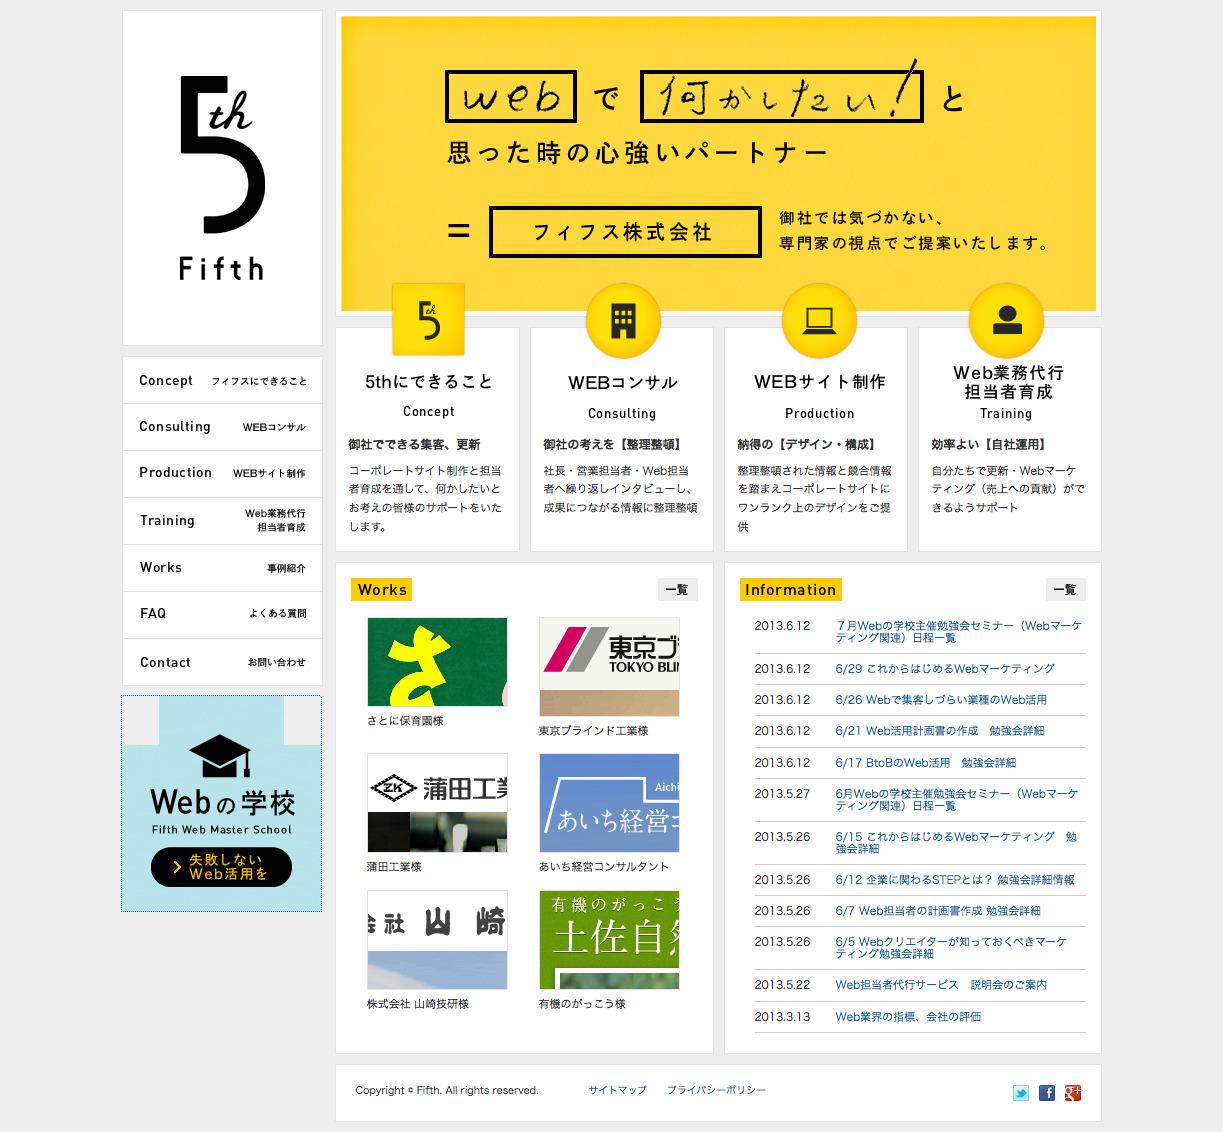 WEB担当者育成とコーポレートサイト制作のフィフス5th株式会社